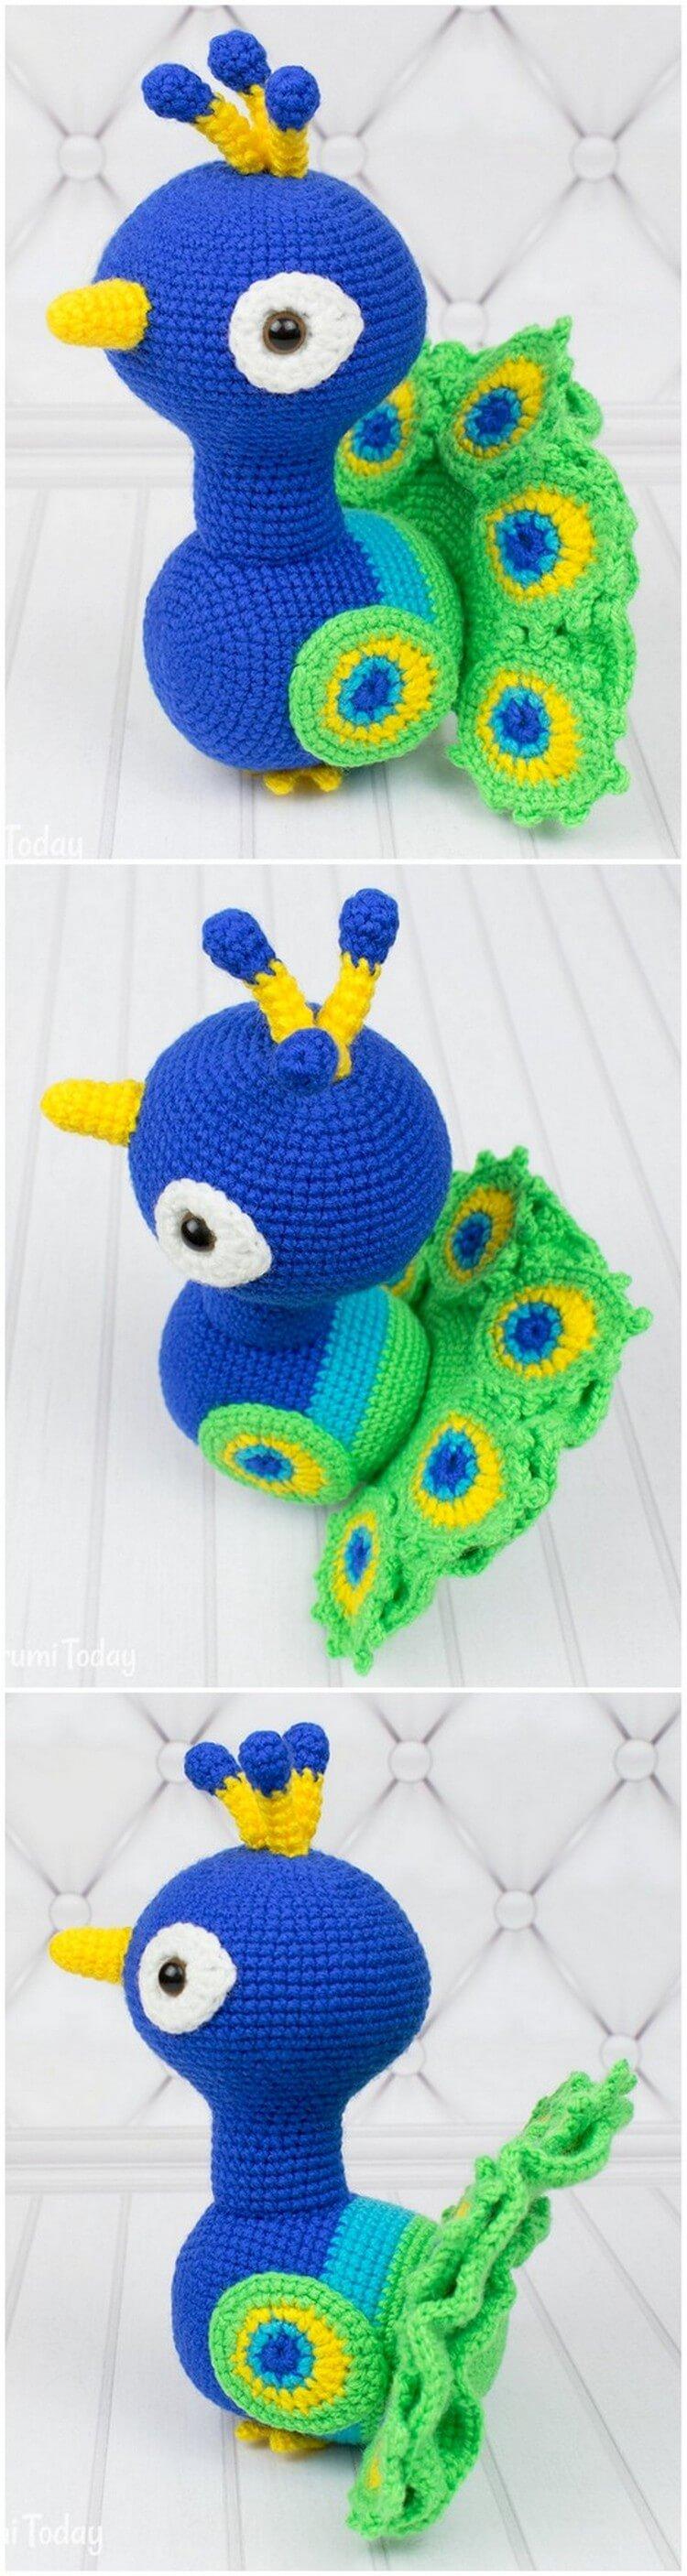 Crochet Amigurumi Pattern (33)